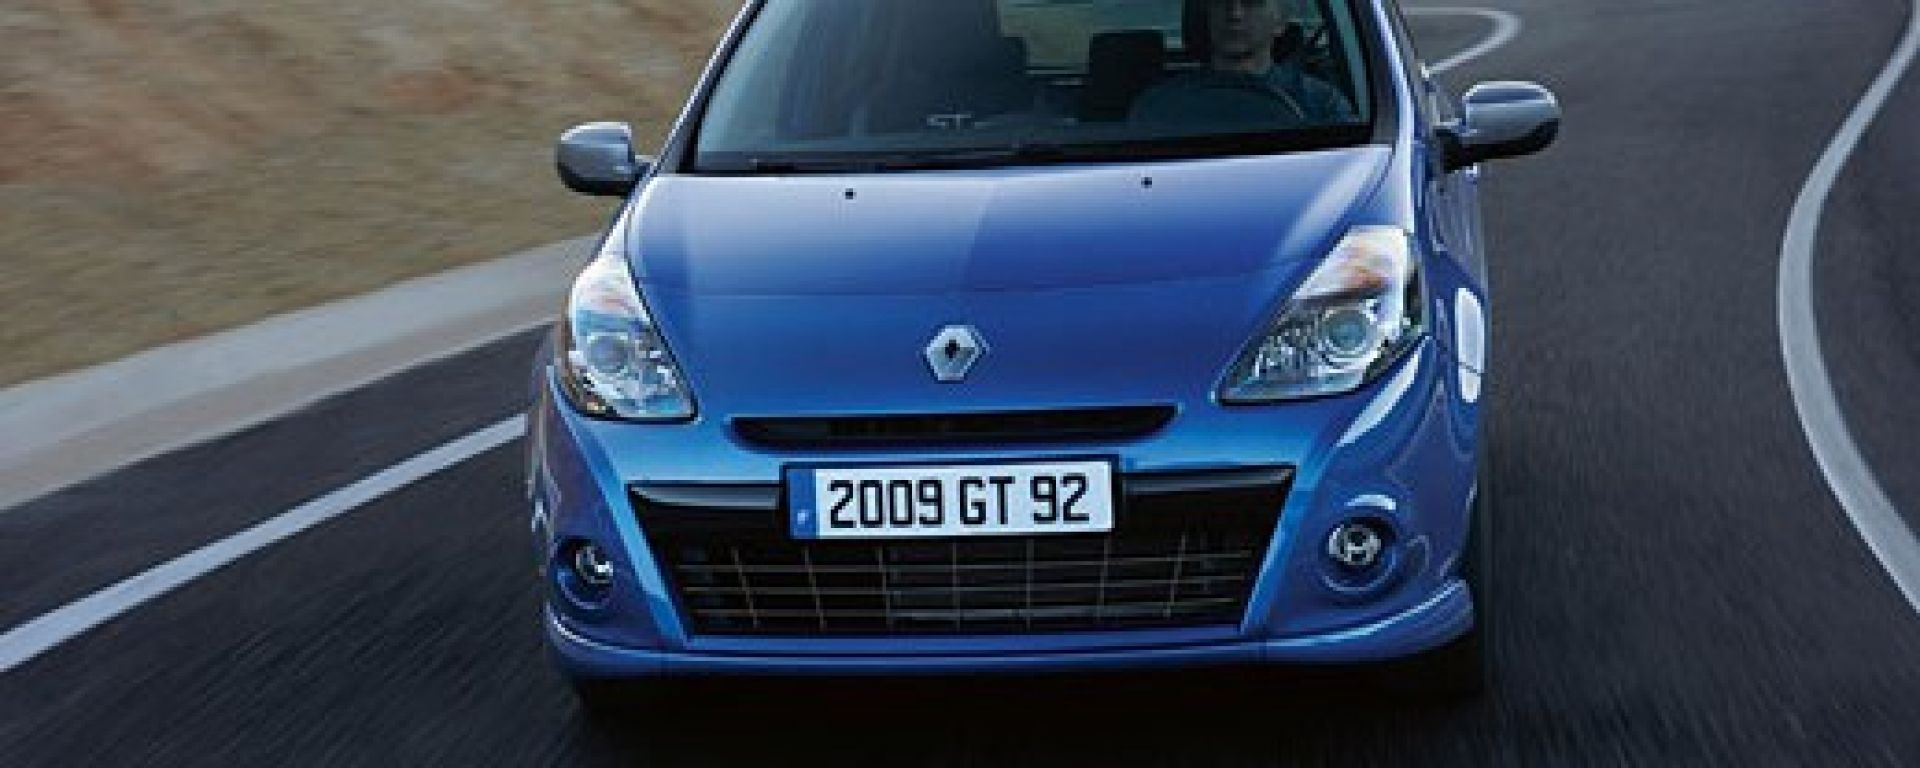 Nuova Clio III  GT